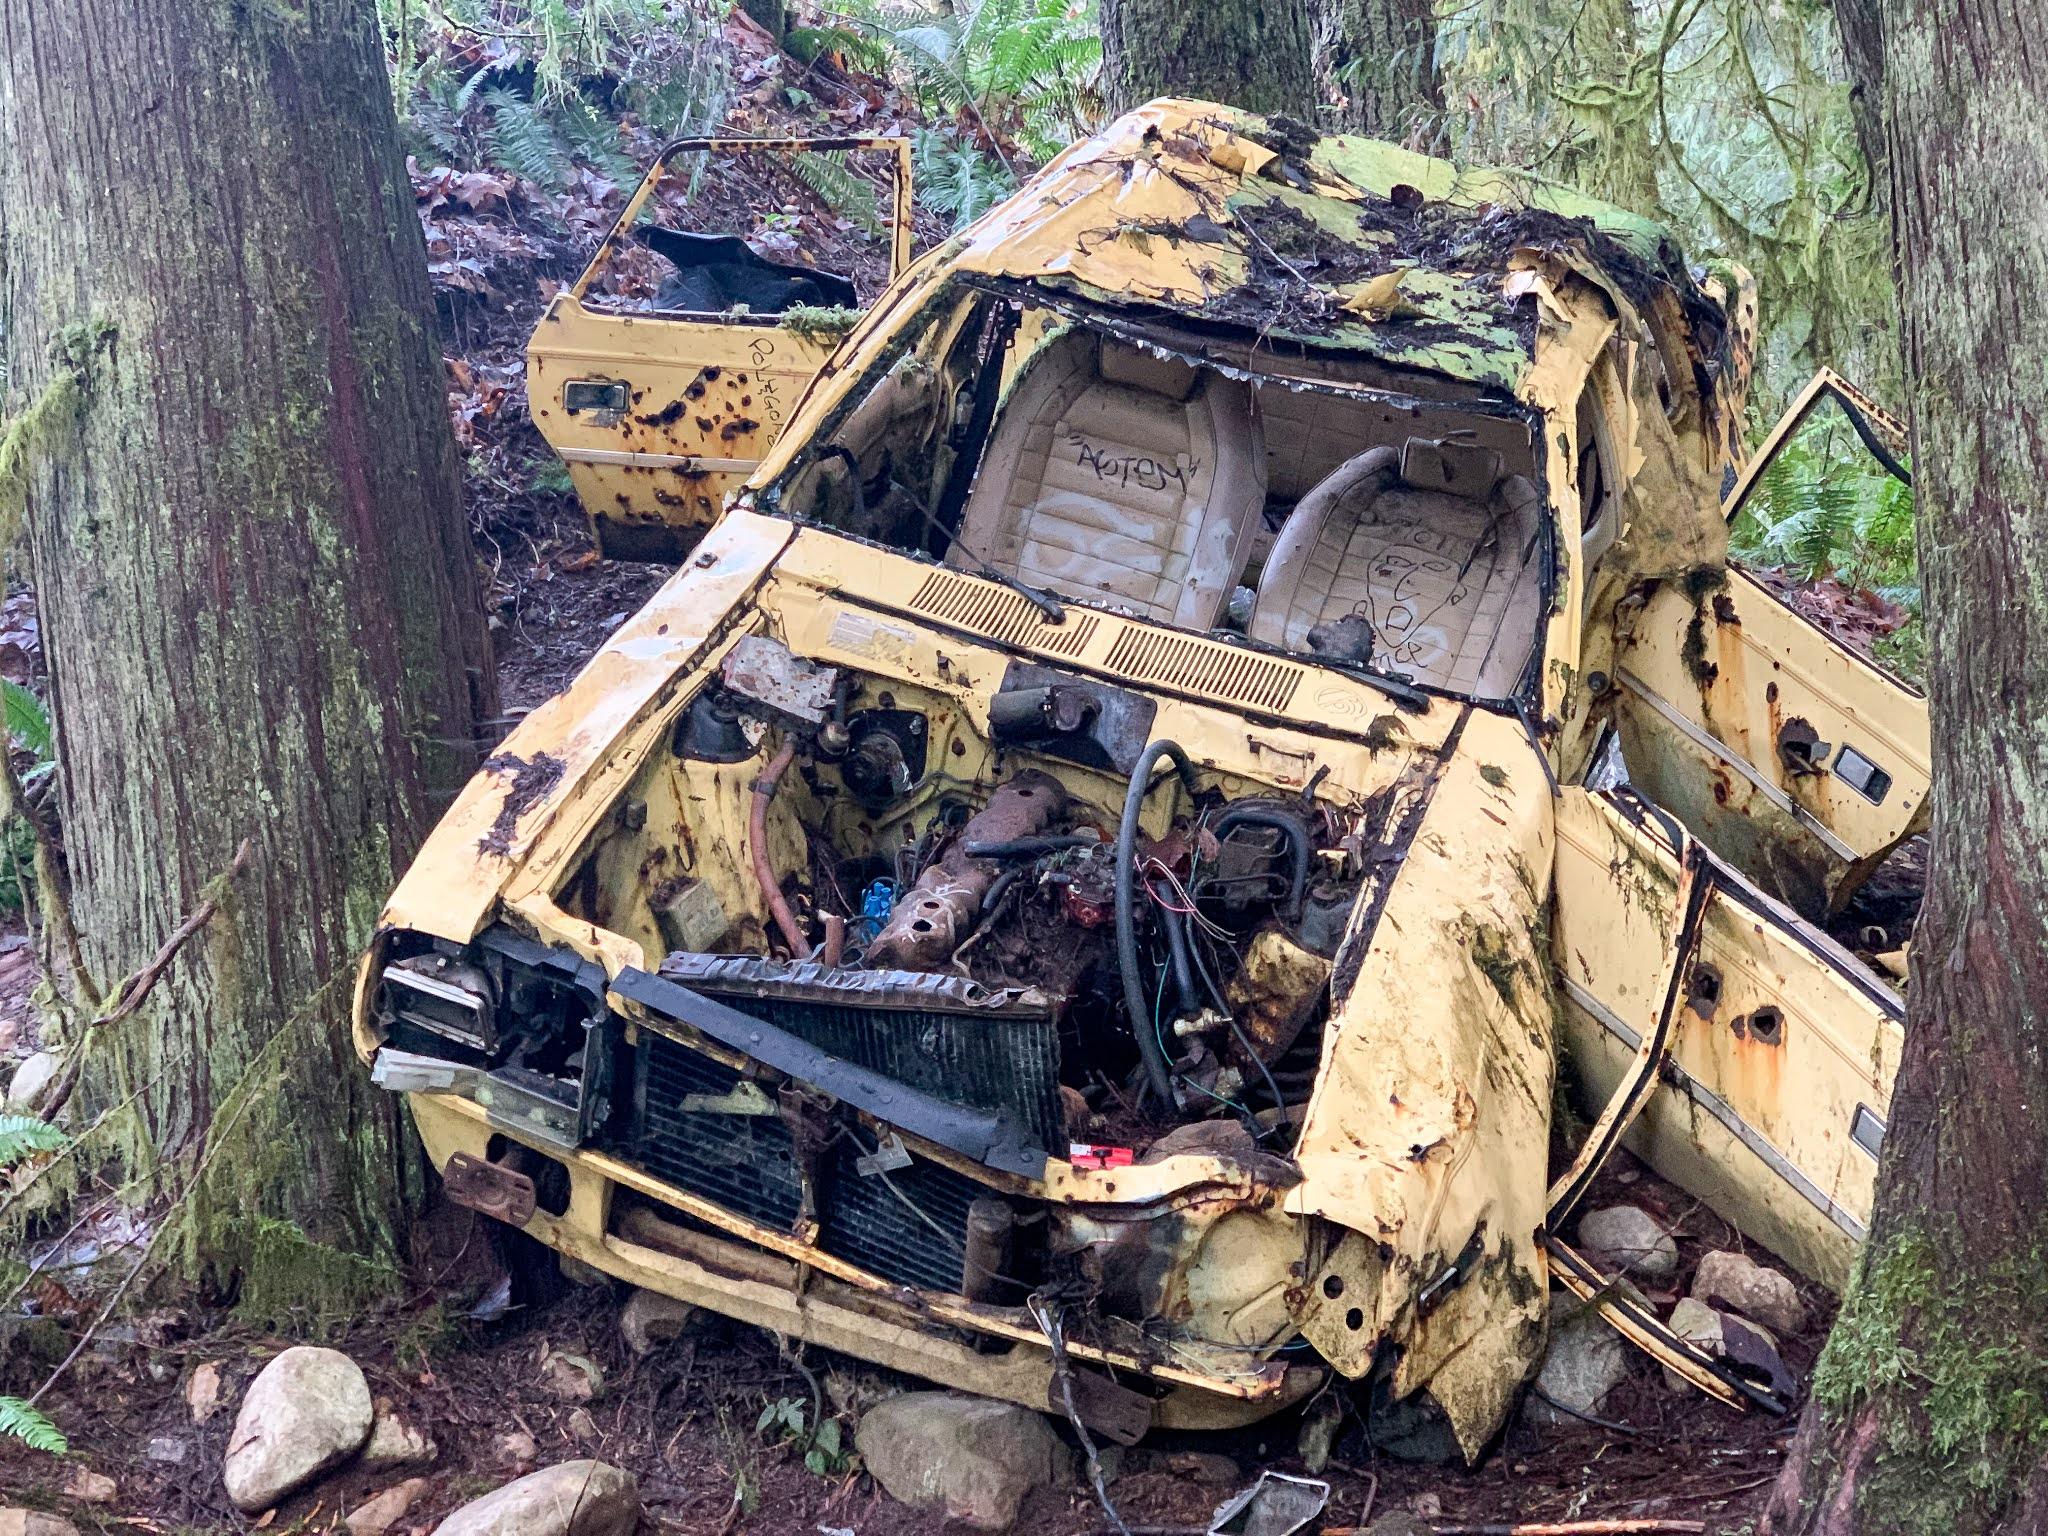 Abandoned car at Cherry Creek